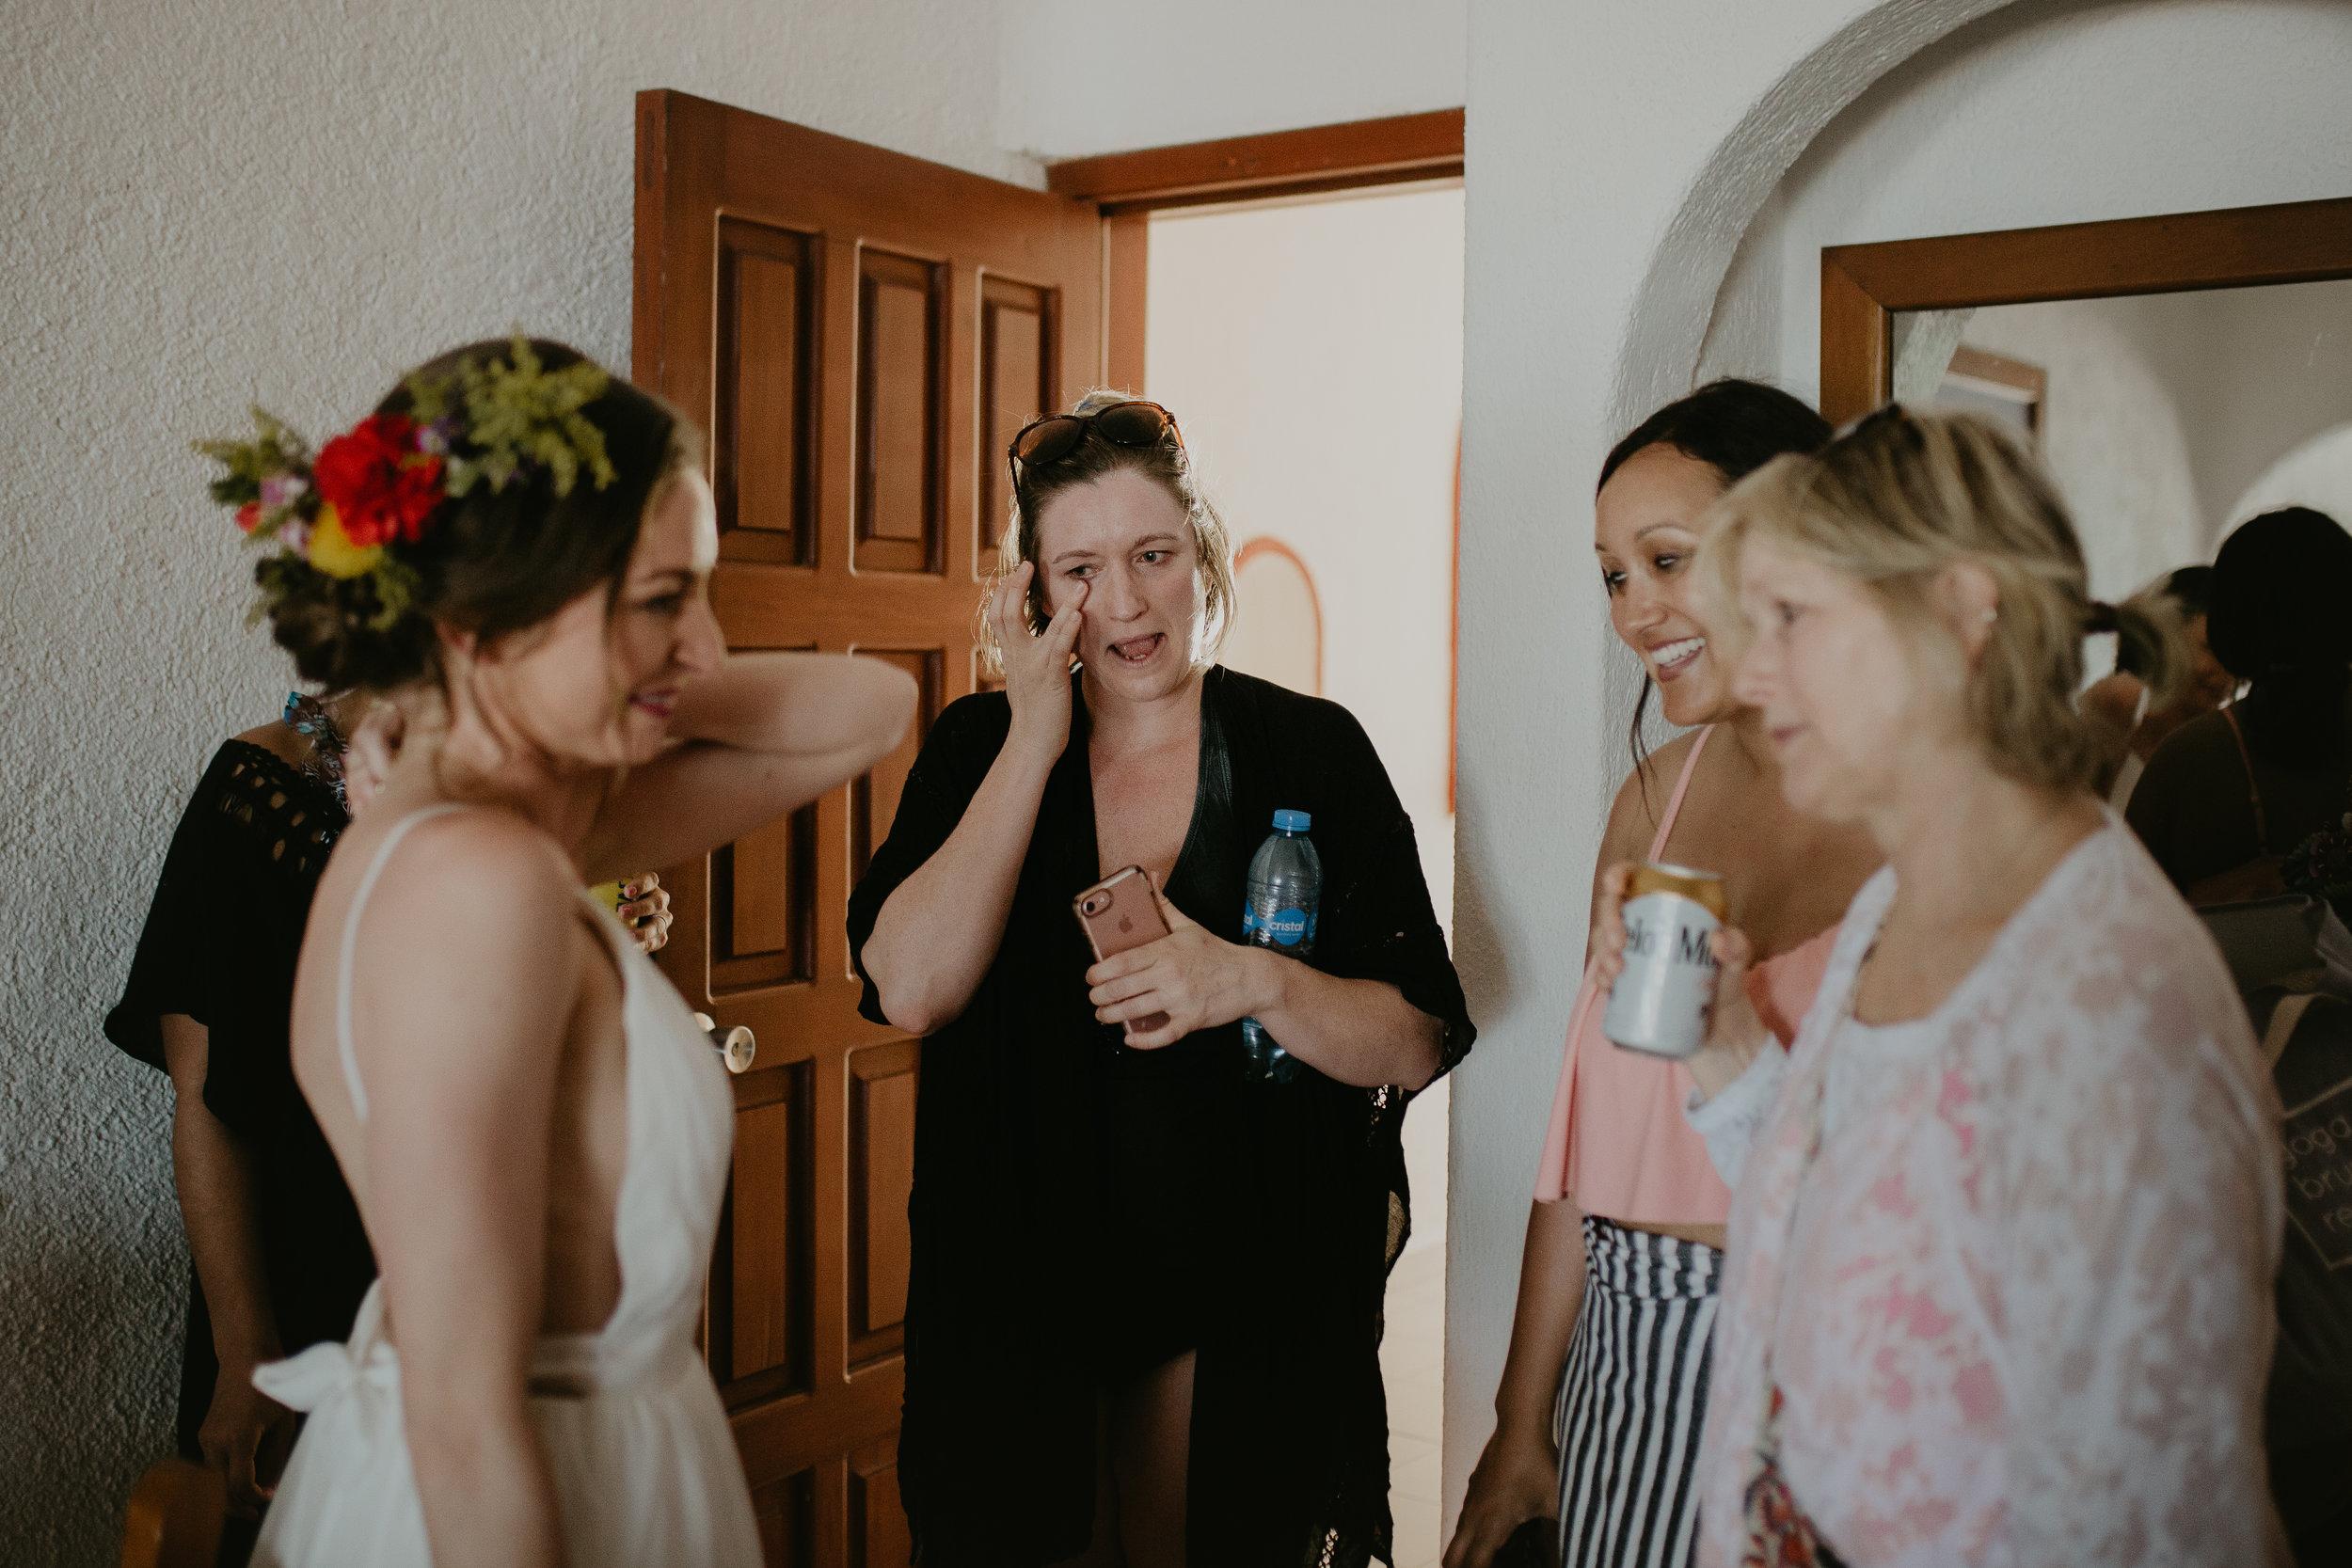 Nicole-Daacke-Photography-beachfront-akumal-destionation-wedding-tulum-mexico-elopement-photographer-destination-wedding-inspiration-sunset-champagne-pop-boho-bride-ocean-tropical-bohemian-tulum-wedding-photos-108.jpg